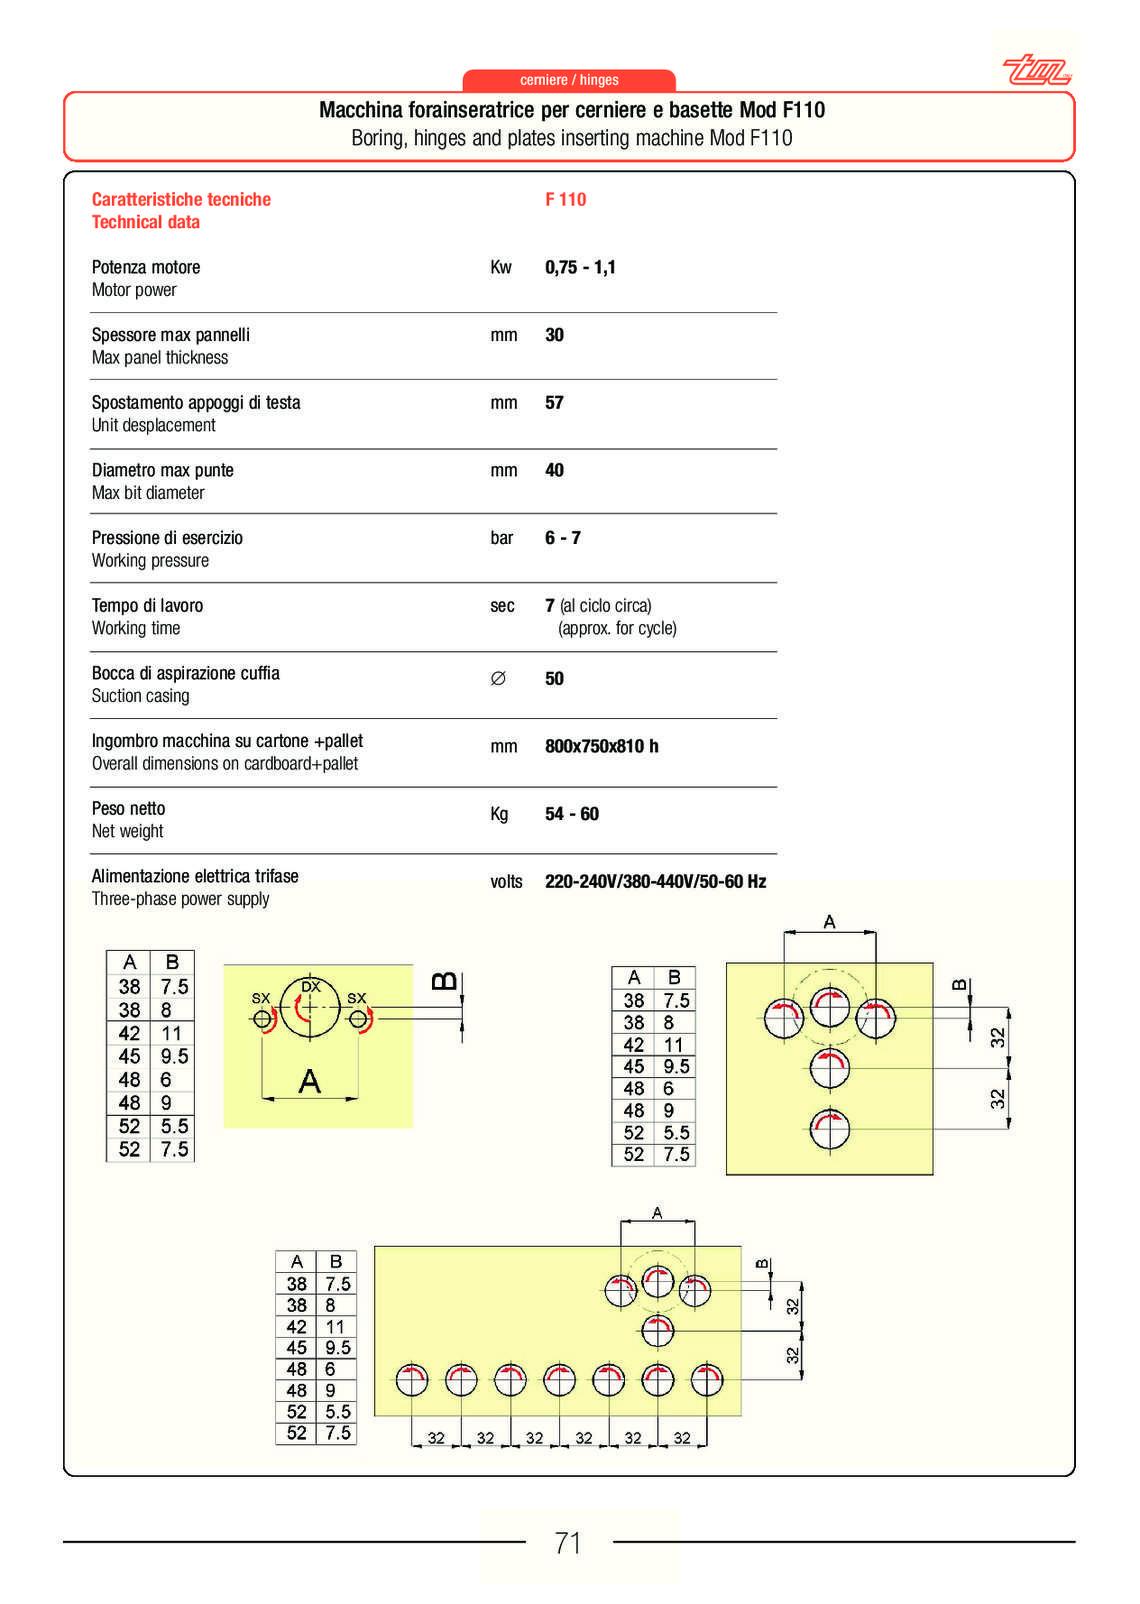 euro-hinges-catalogue_175_070.jpg